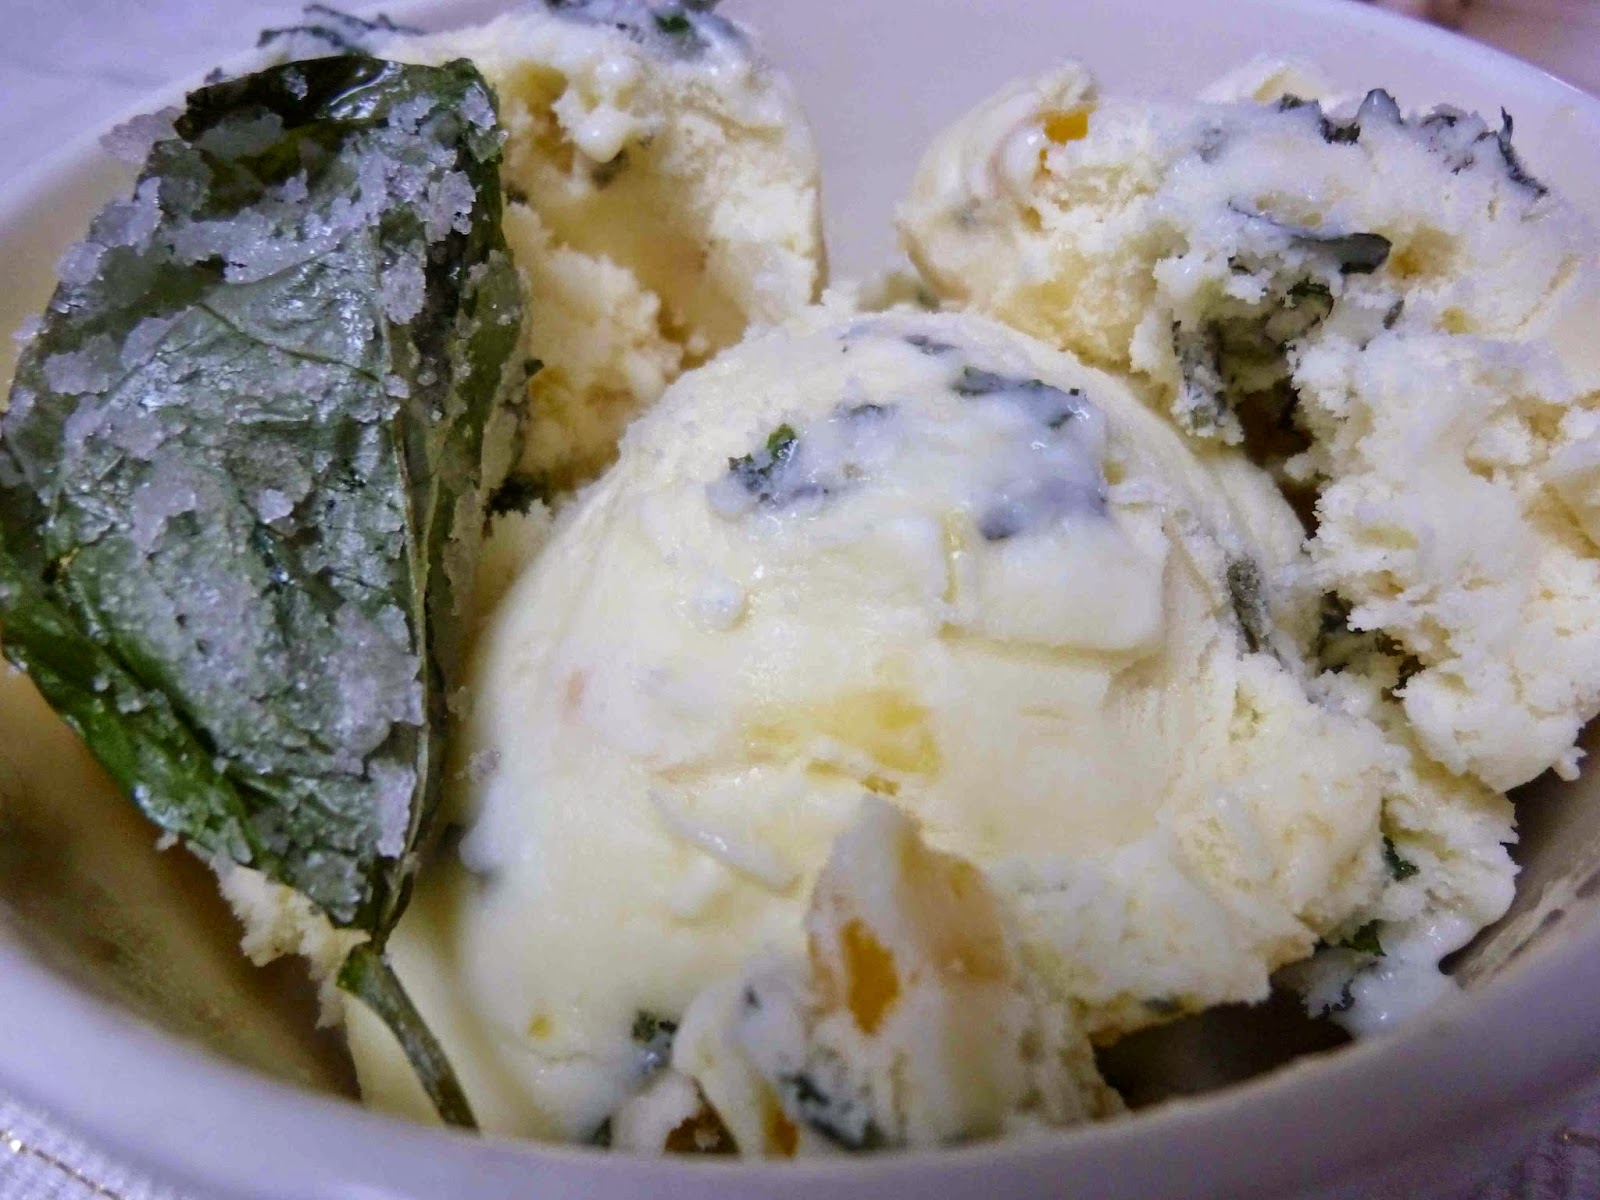 the sweet corn ice cream ingredients 4 egg yolks 2 cups heavy cream ...